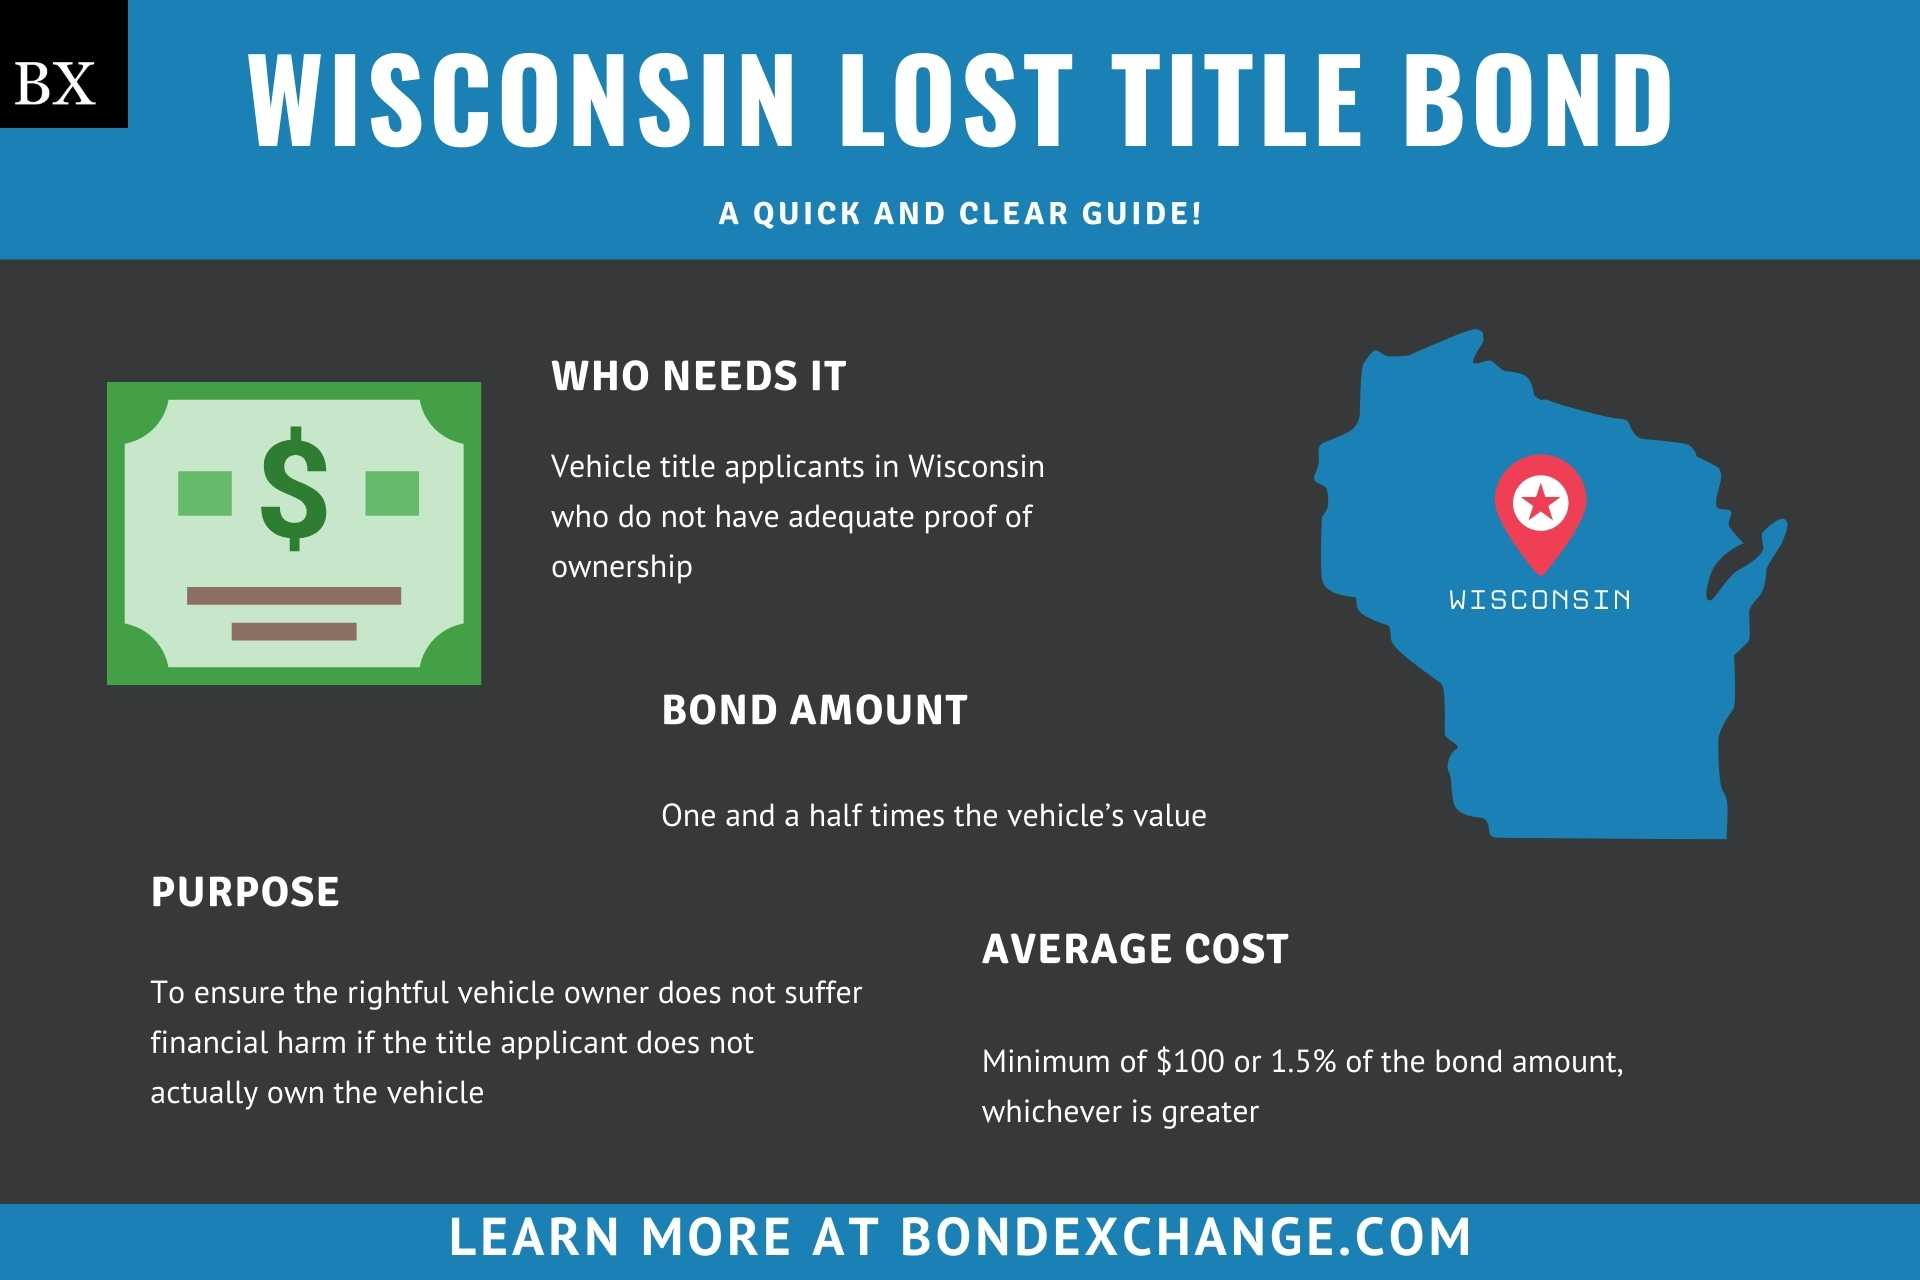 Wisconsin Lost Title Bond